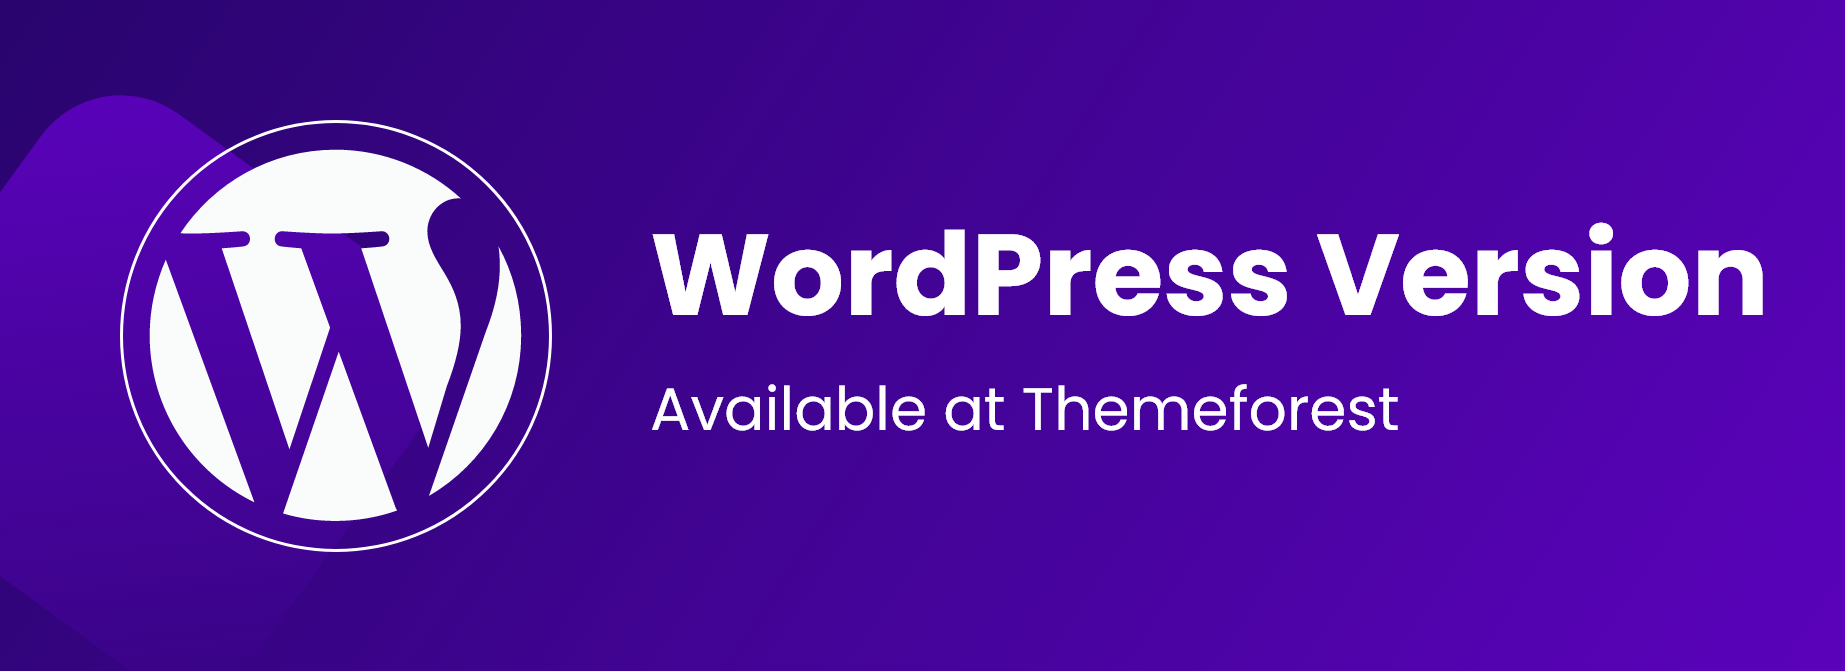 oxo app landing WordPress theme